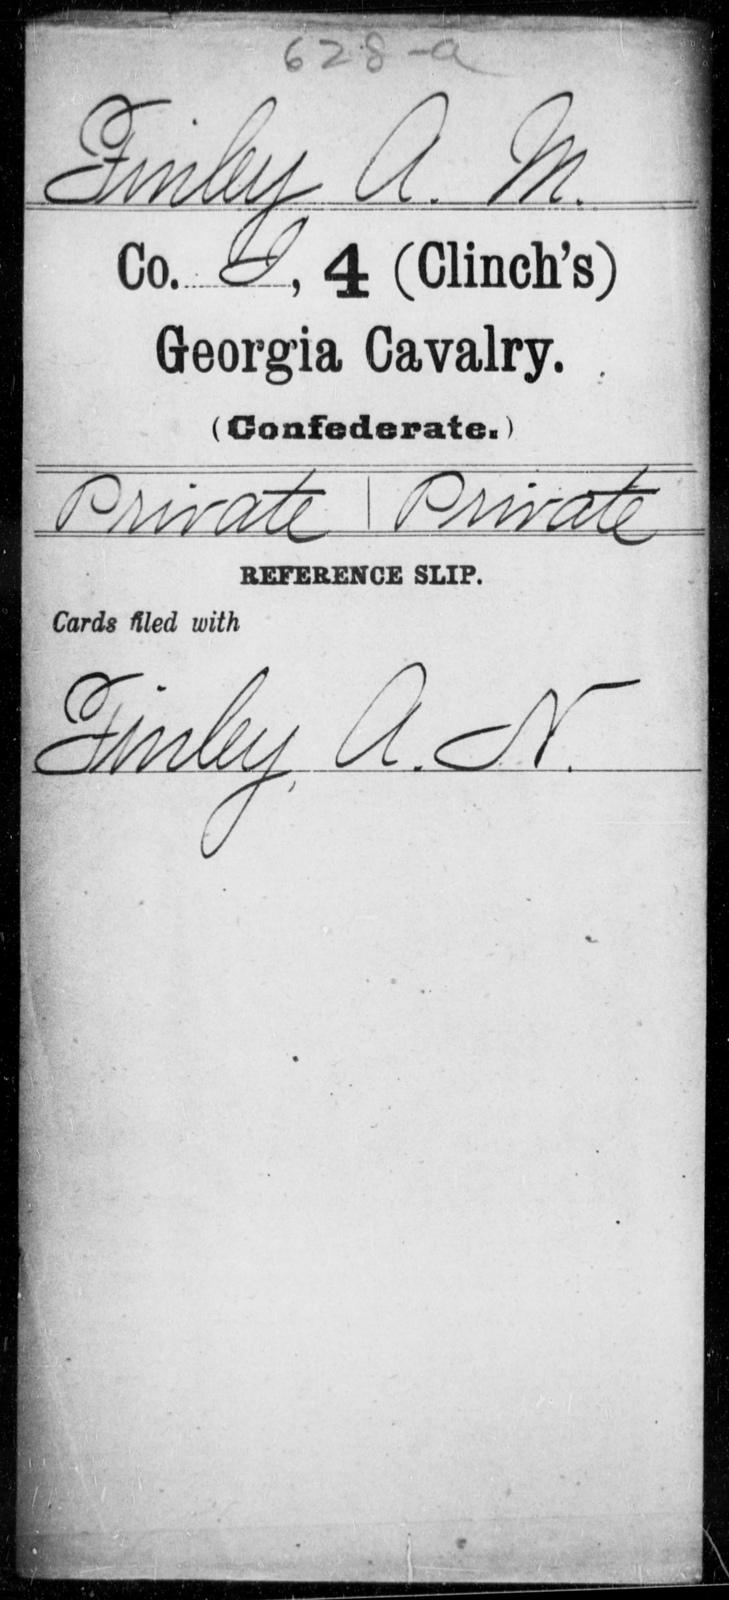 Finley, A M - 4th (Clinch's) Cavalry